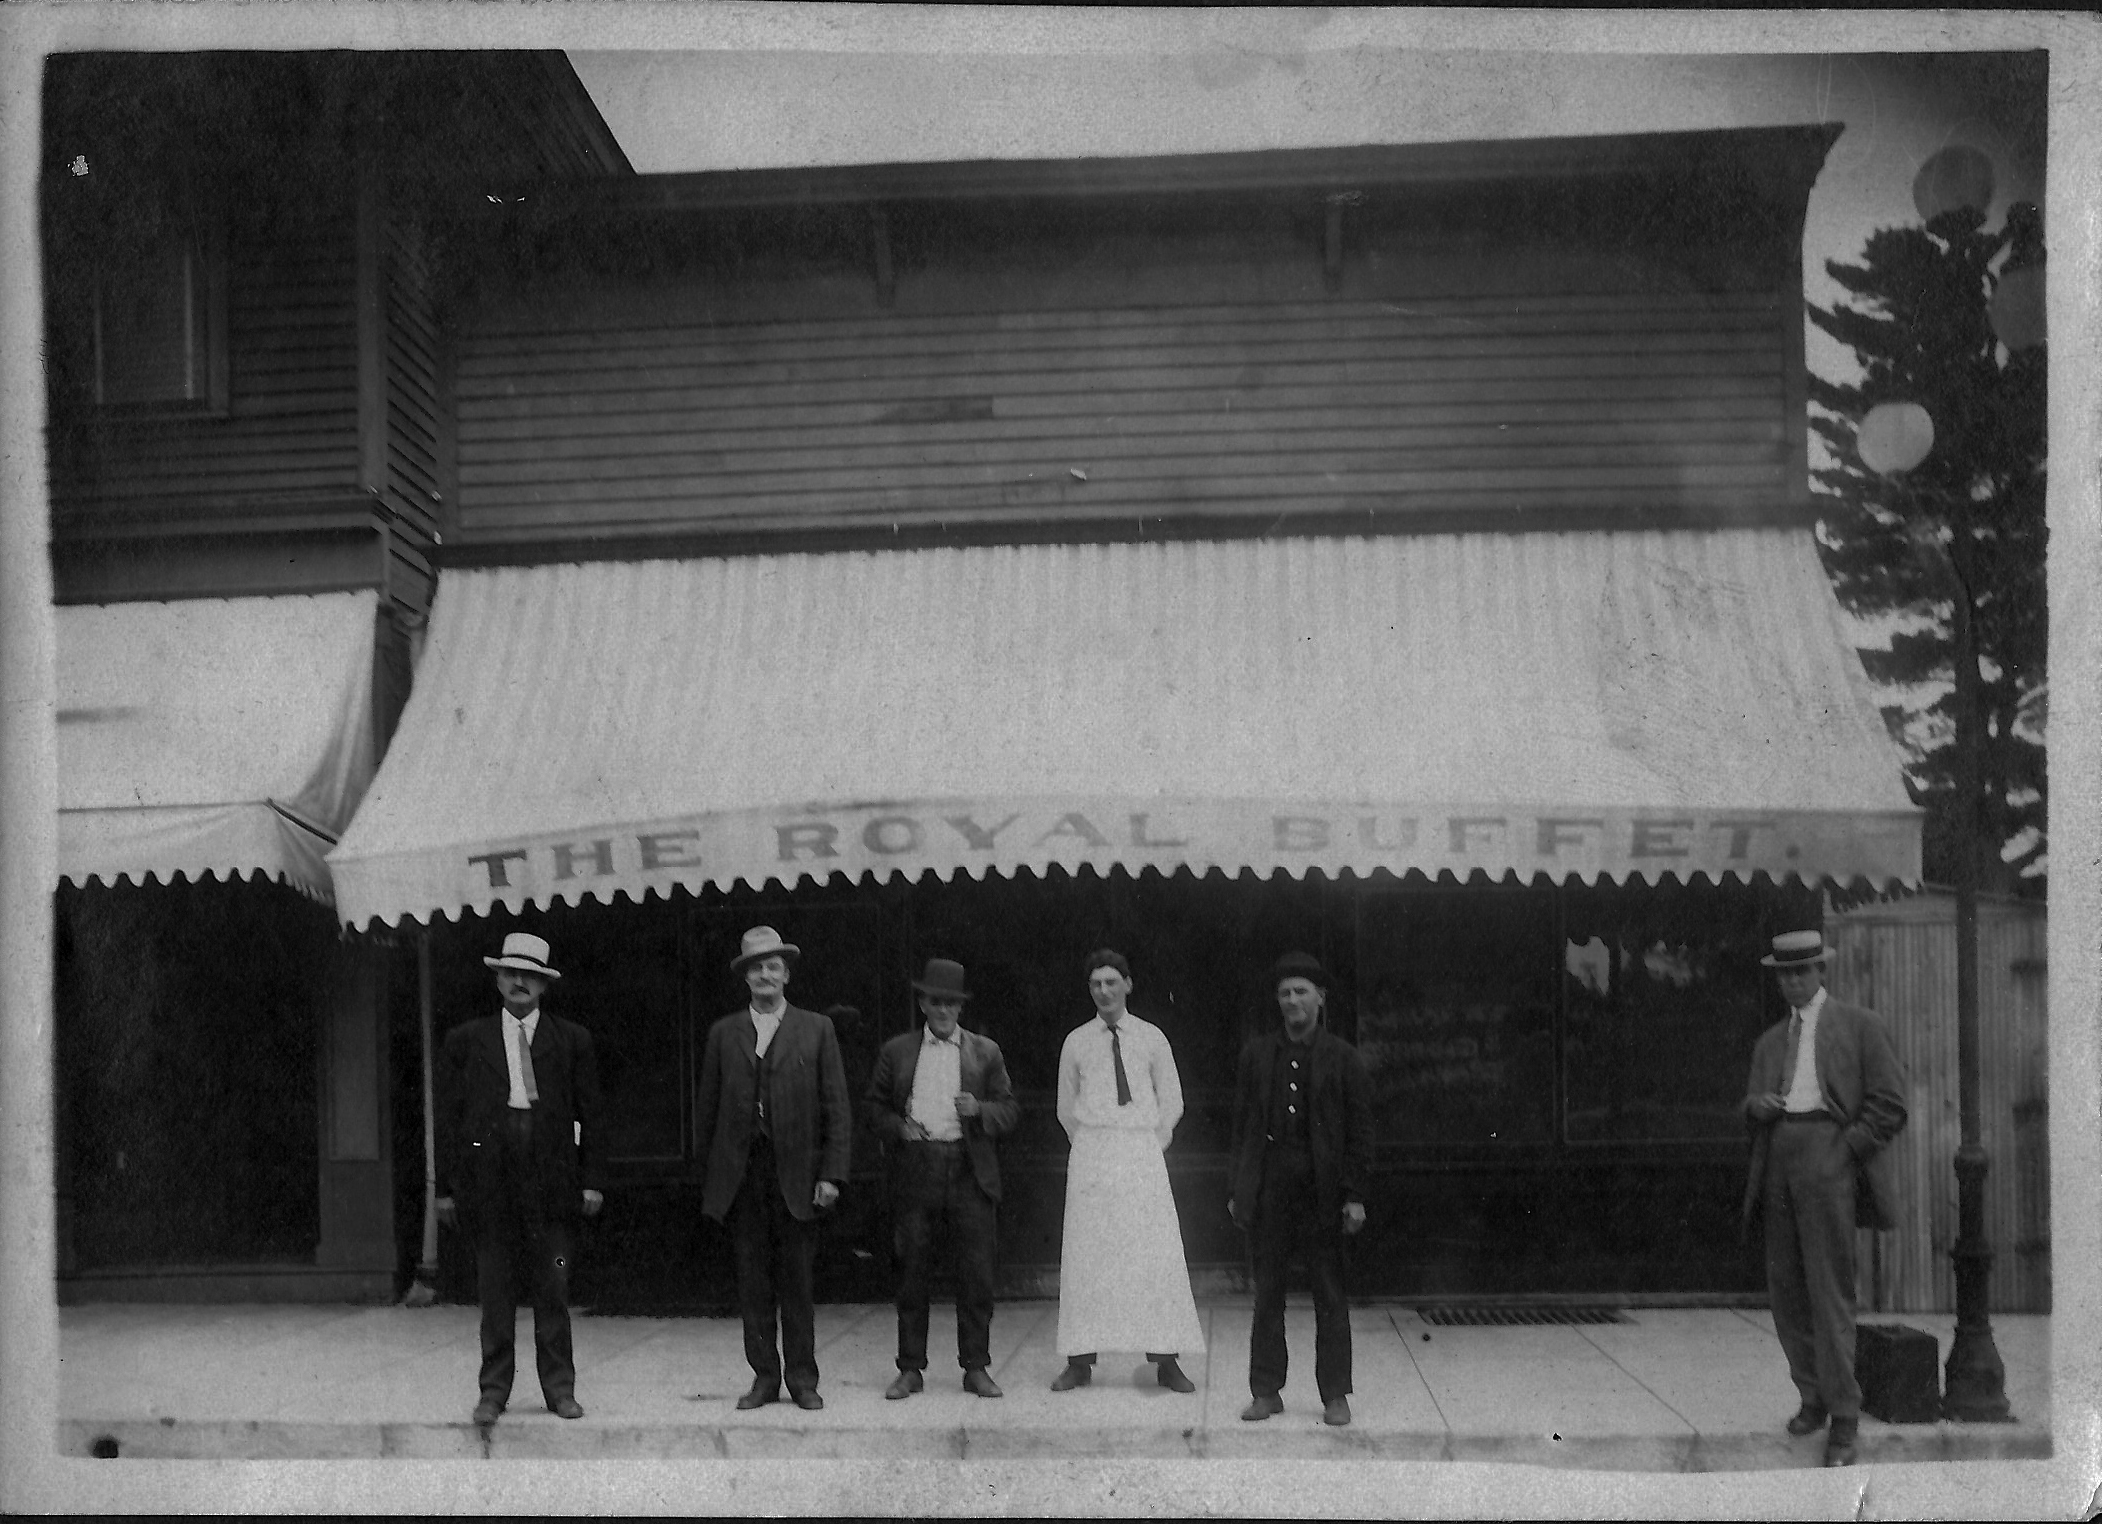 Royal Buffet, Kindred Avenue, Grand Rapids, Minn ca. 1900-1905